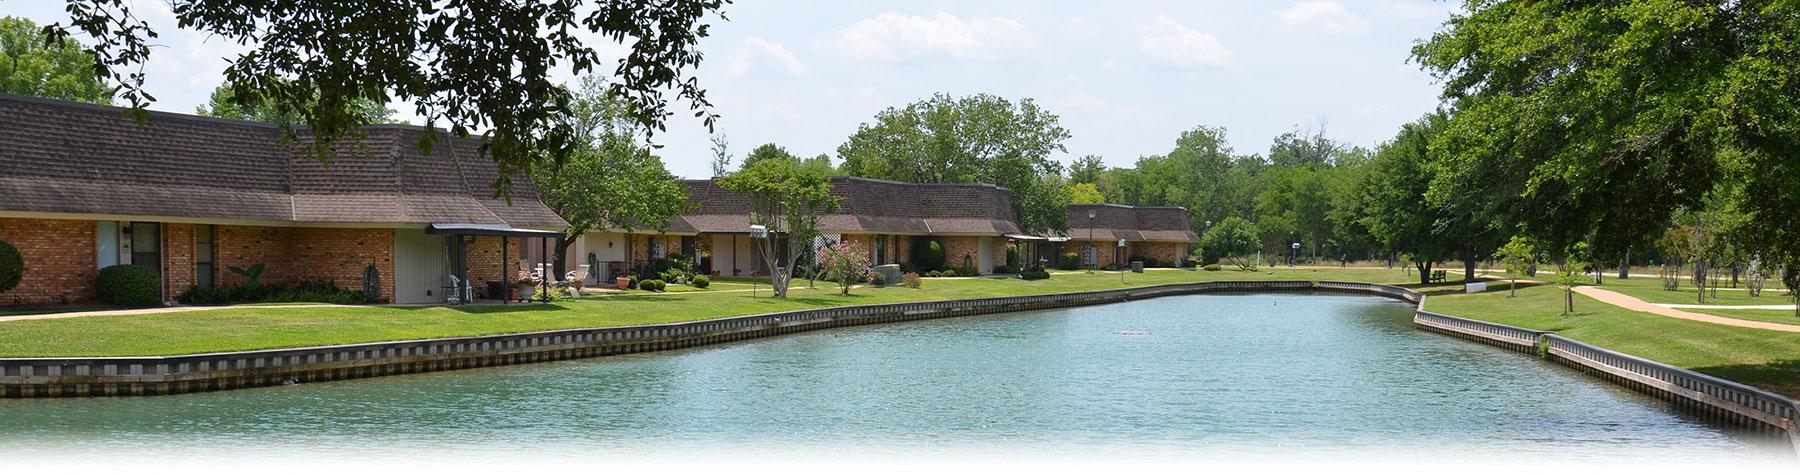 Total Body for Garden Apartments - The Oaks of Louisiana